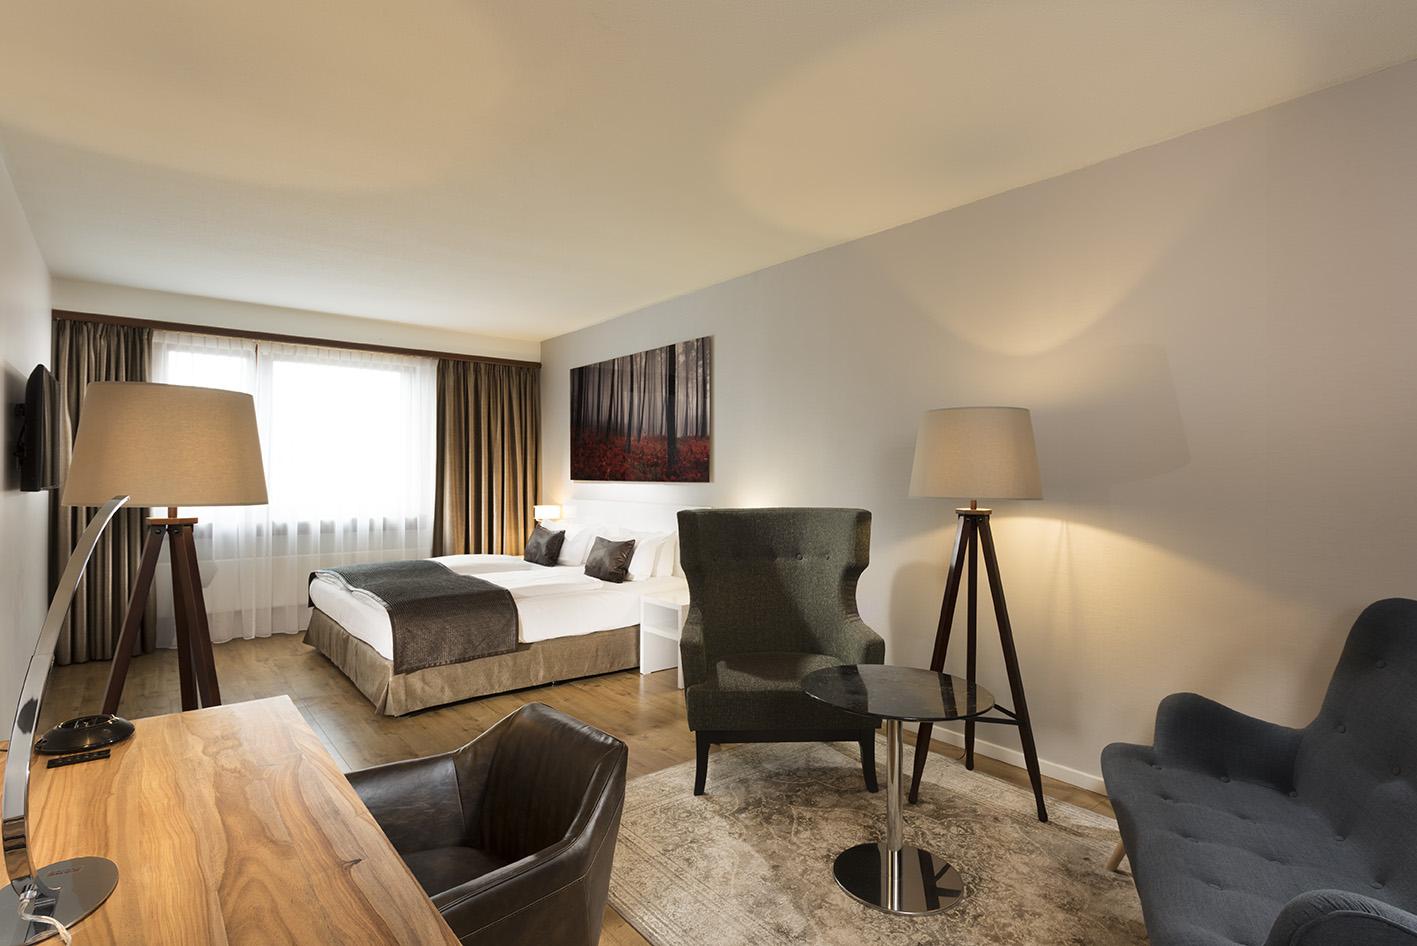 Wyndham Hotel Stuttgart - Großzügige Zimmer, Top Verkehrsanbindung